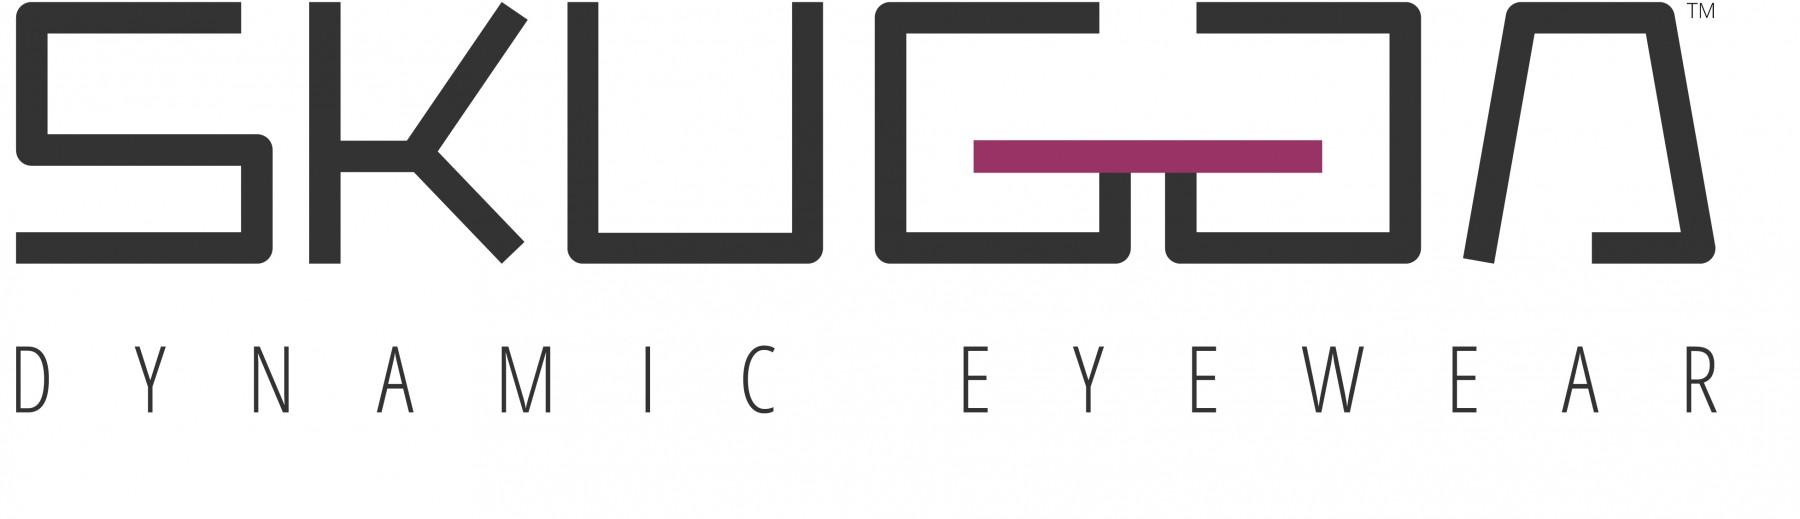 press skugga eyewear